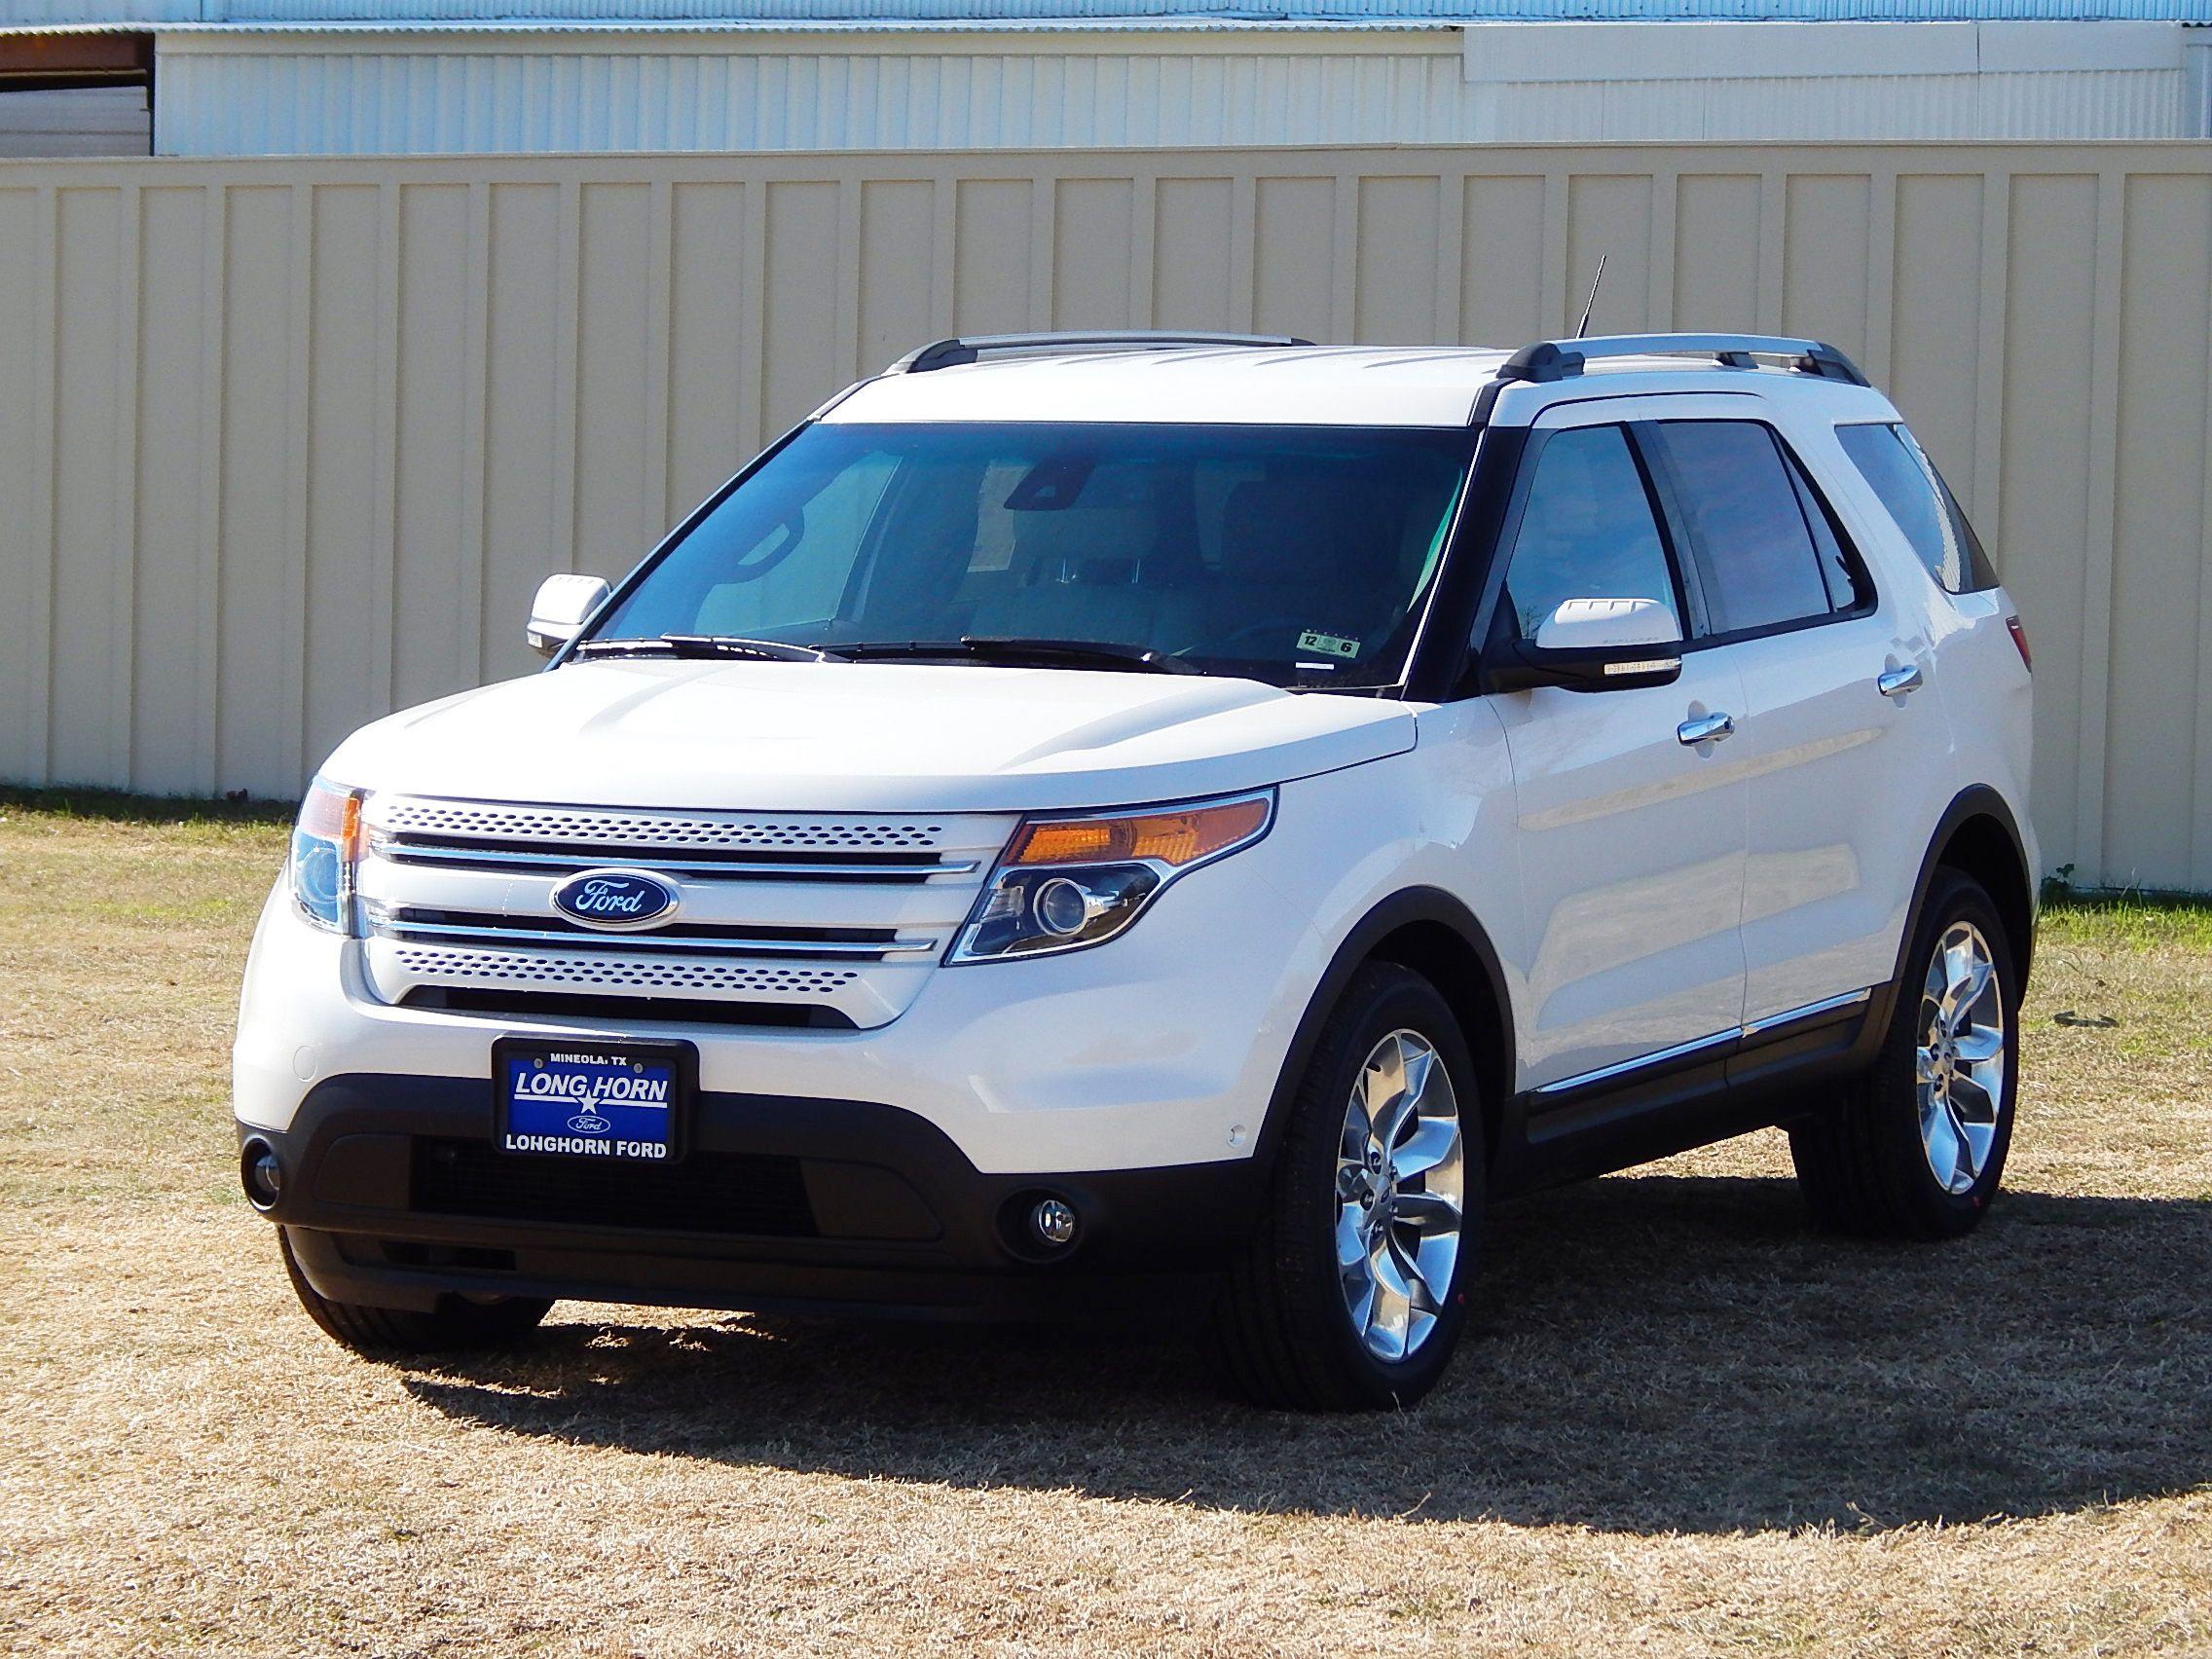 2015 Ford Explorer Limited in White Platinum Metallic Tri